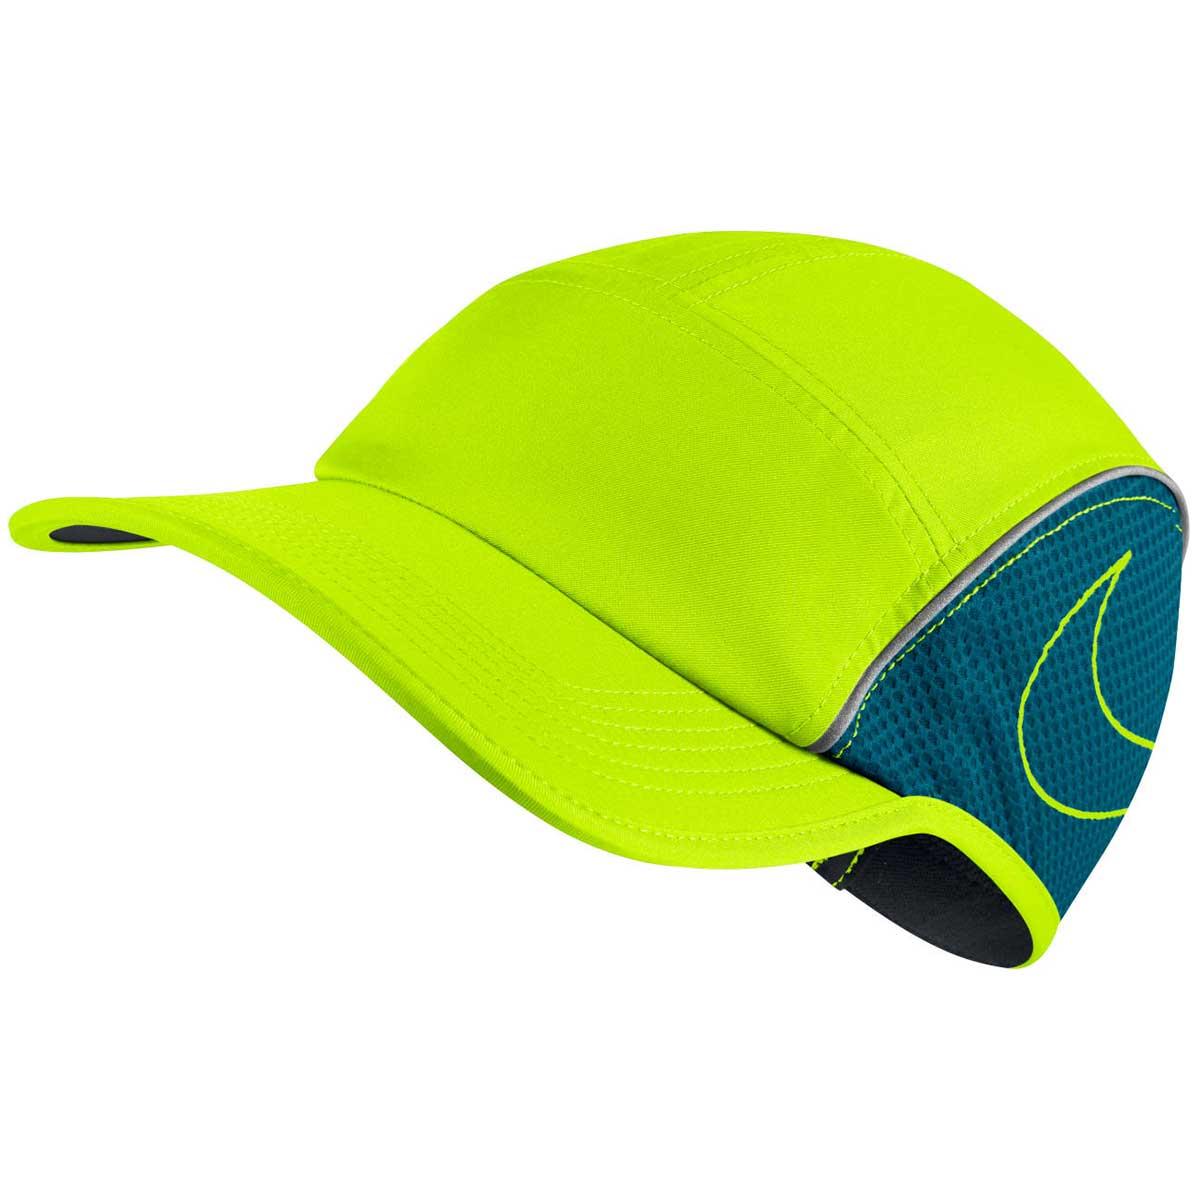 Buy Nike AeroBill Running Cap Online India 5556957979f